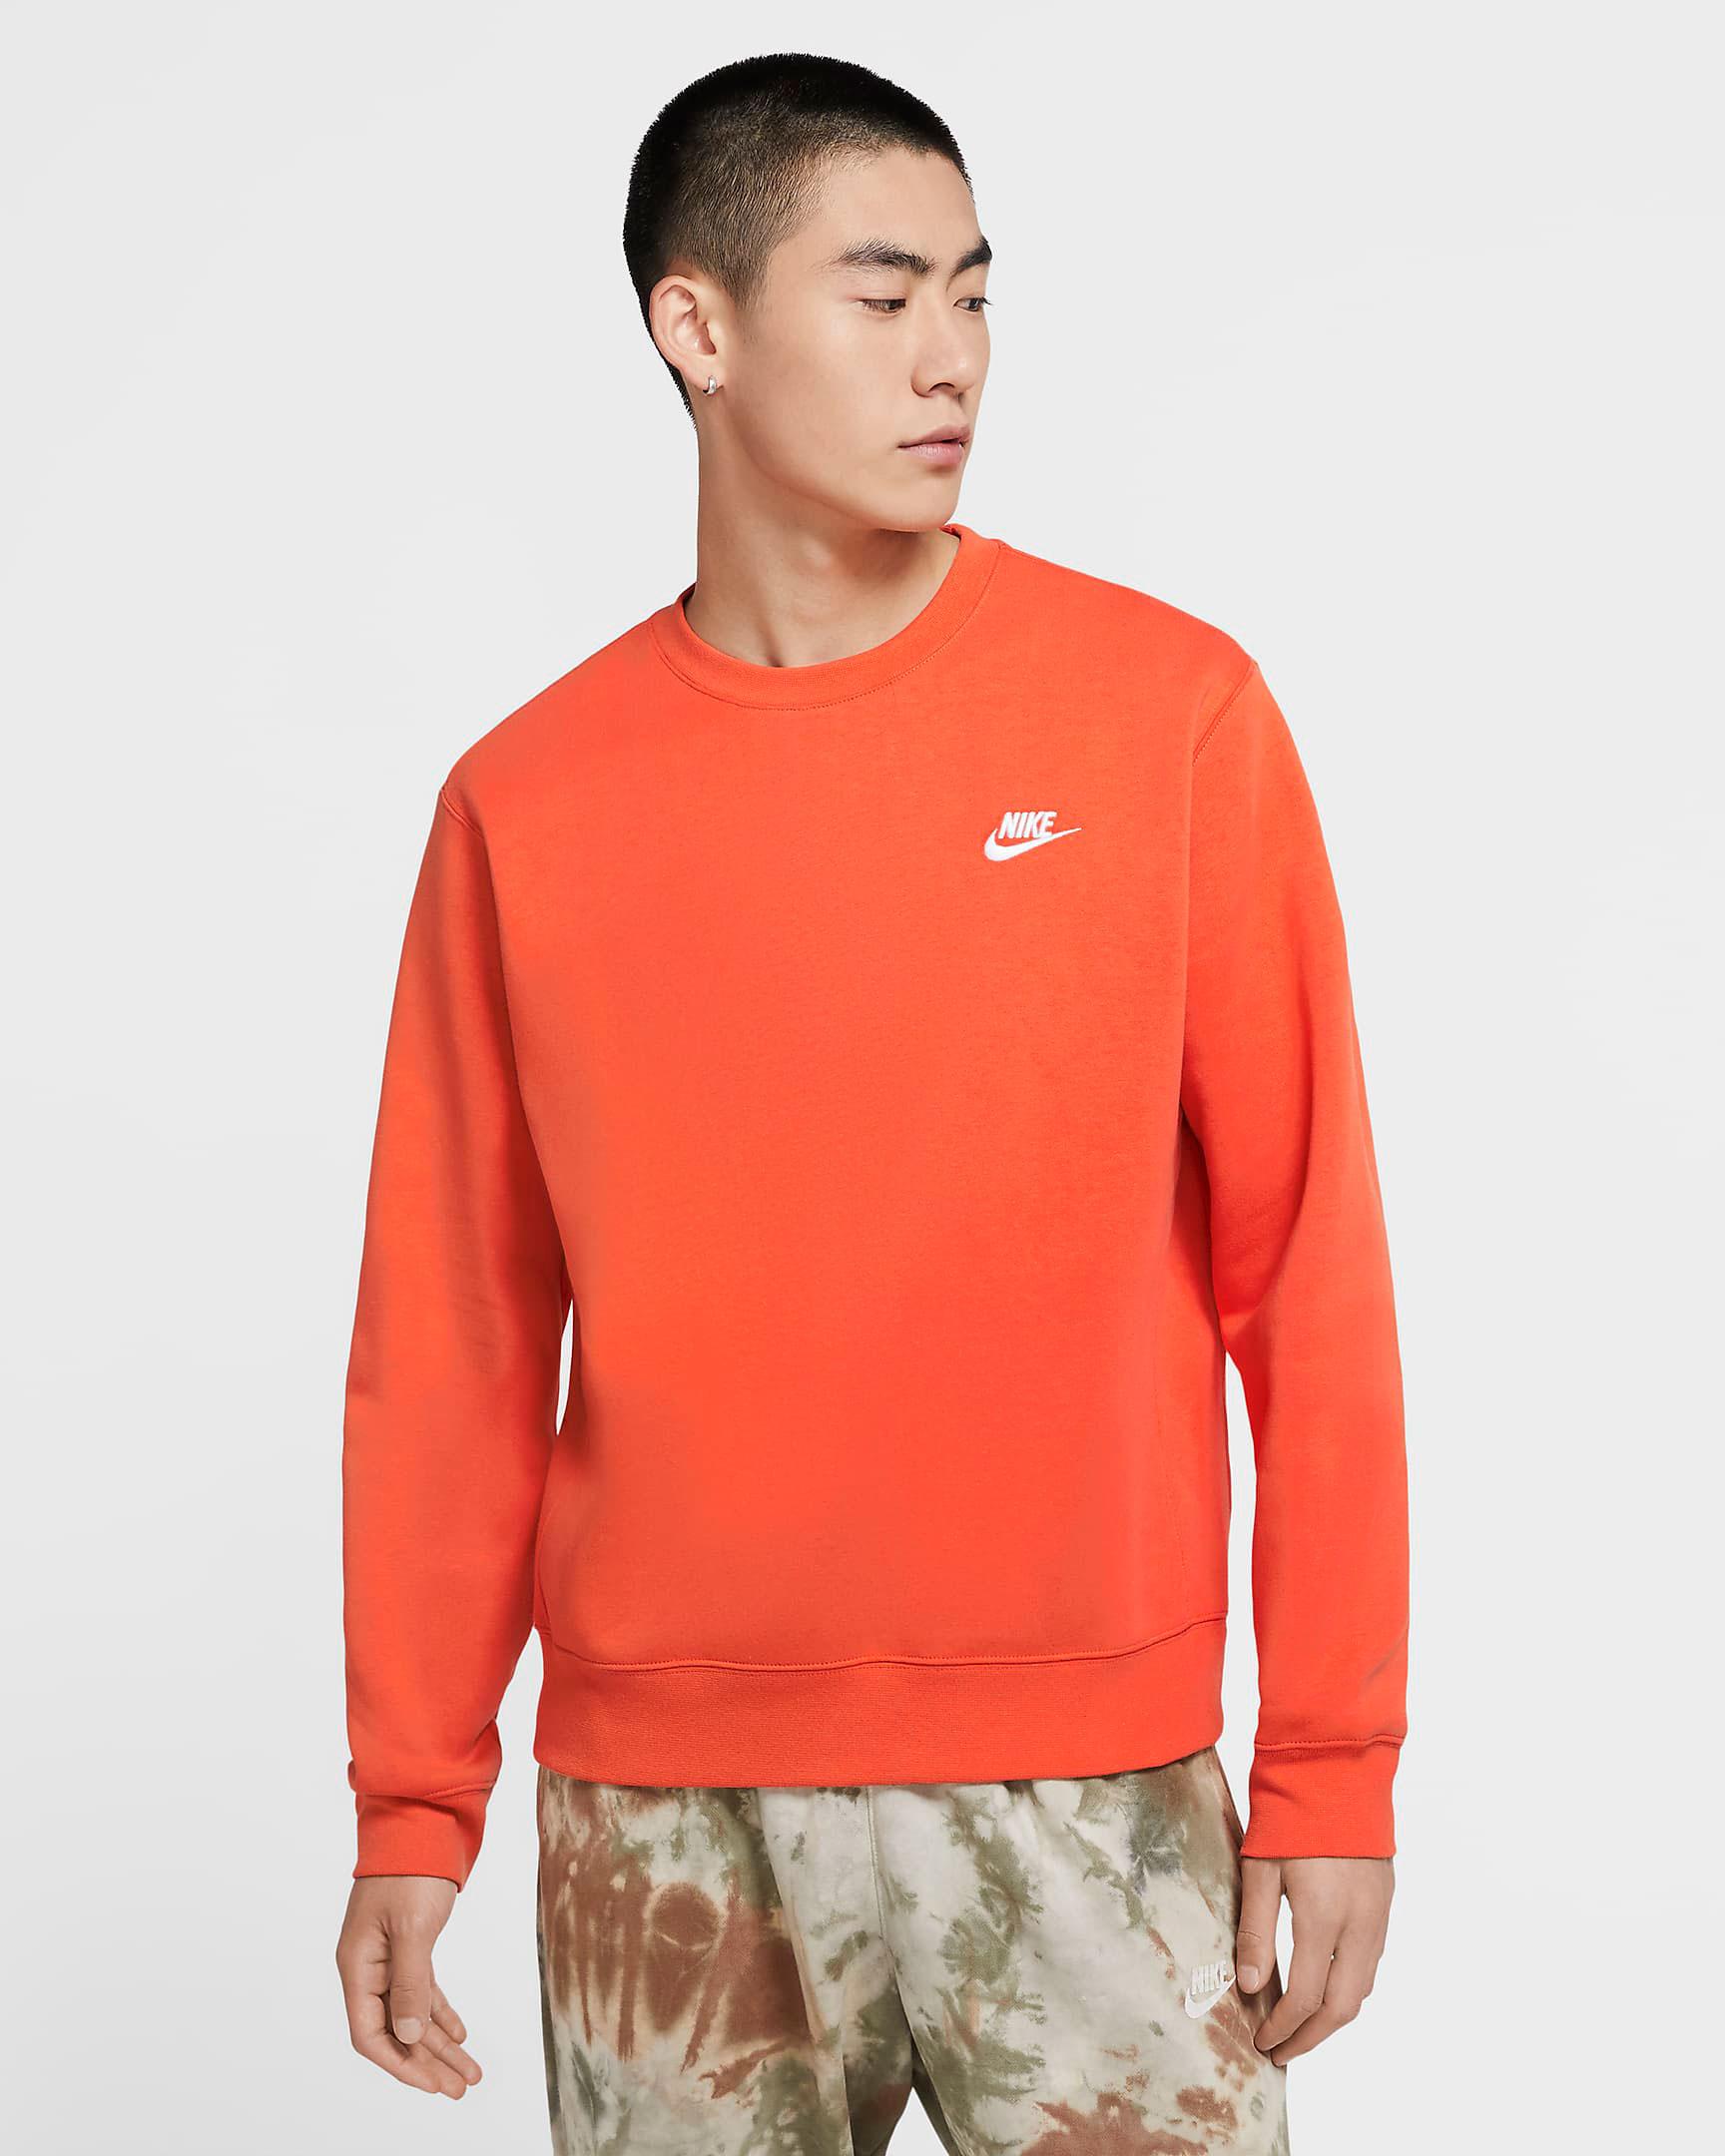 nike-air-foamposite-pro-halloween-orange-sweatshirt